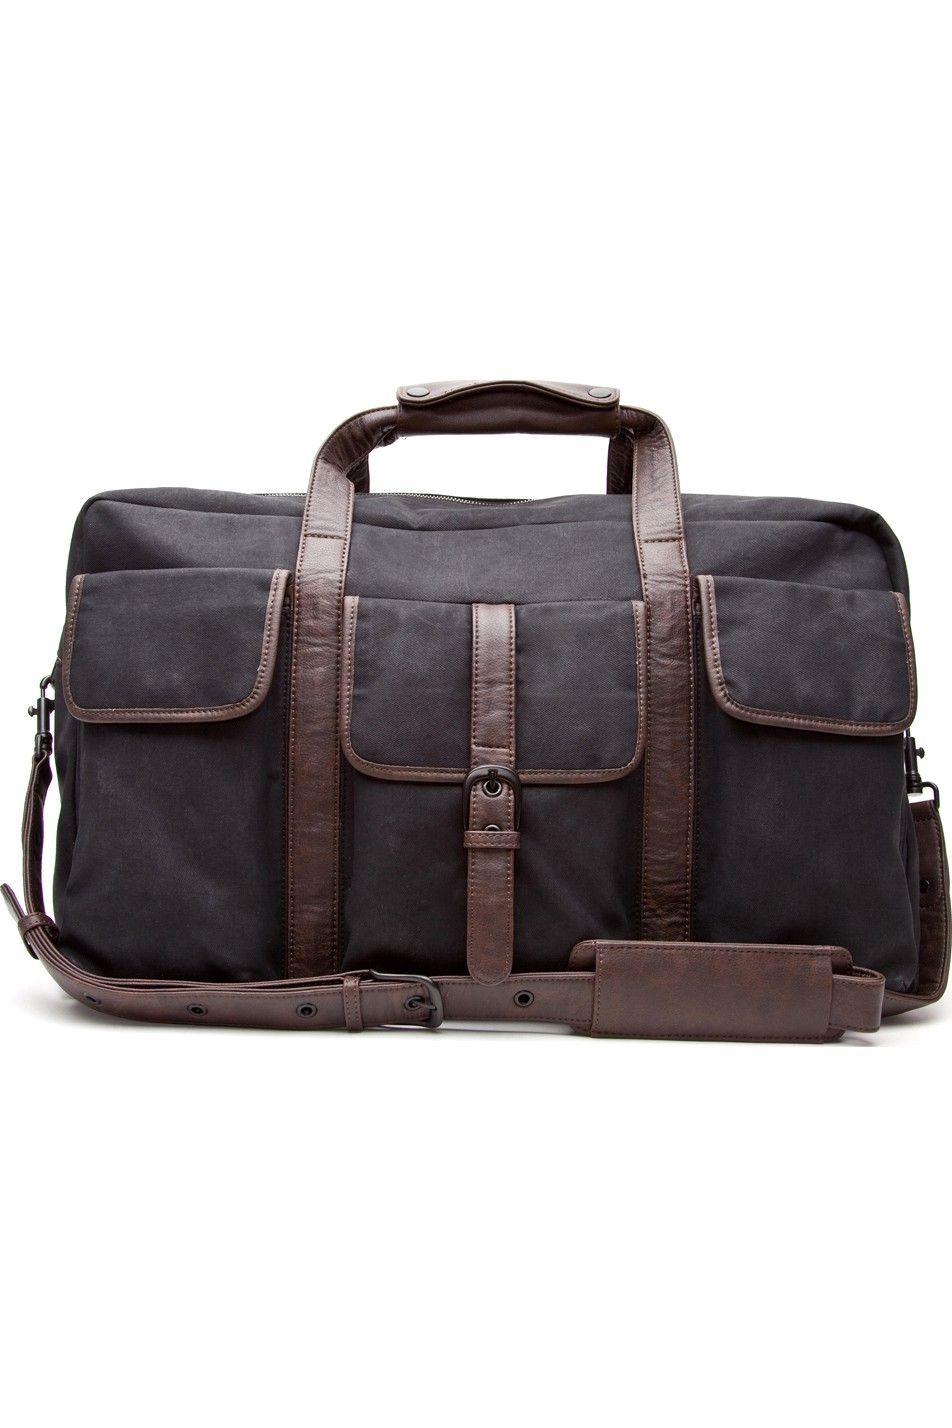 a05d99789ccc Jameson - Black - Travel Bags - Bags - MEN | Movies Online | Bags ...